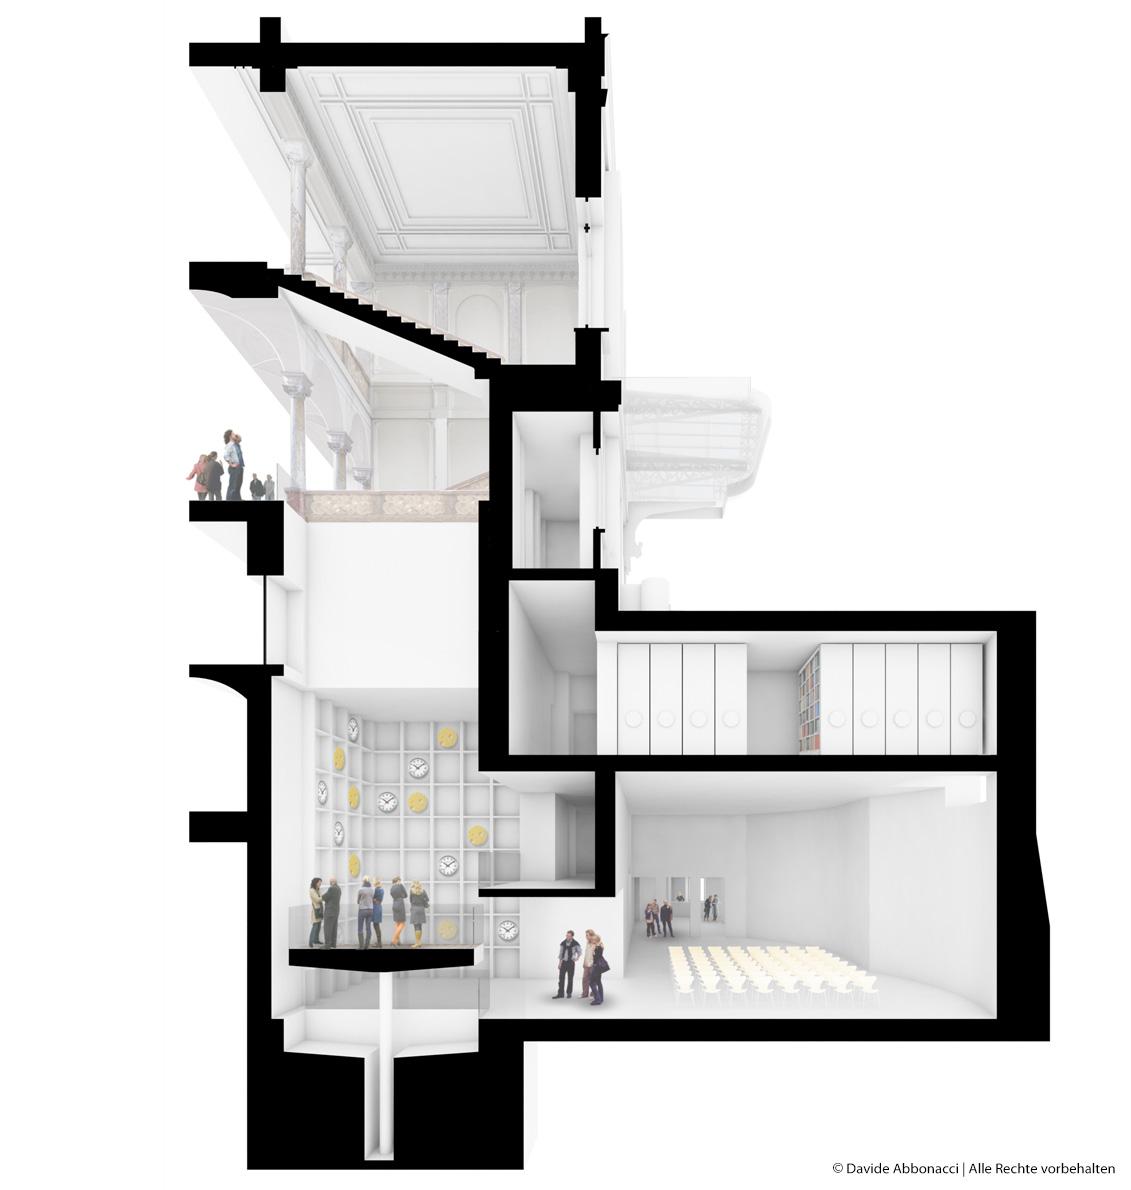 Villa Maraini, Rom, Italien   Kuehn Malvezzi Architekten   2013 Wettbewerbsvisualisierung